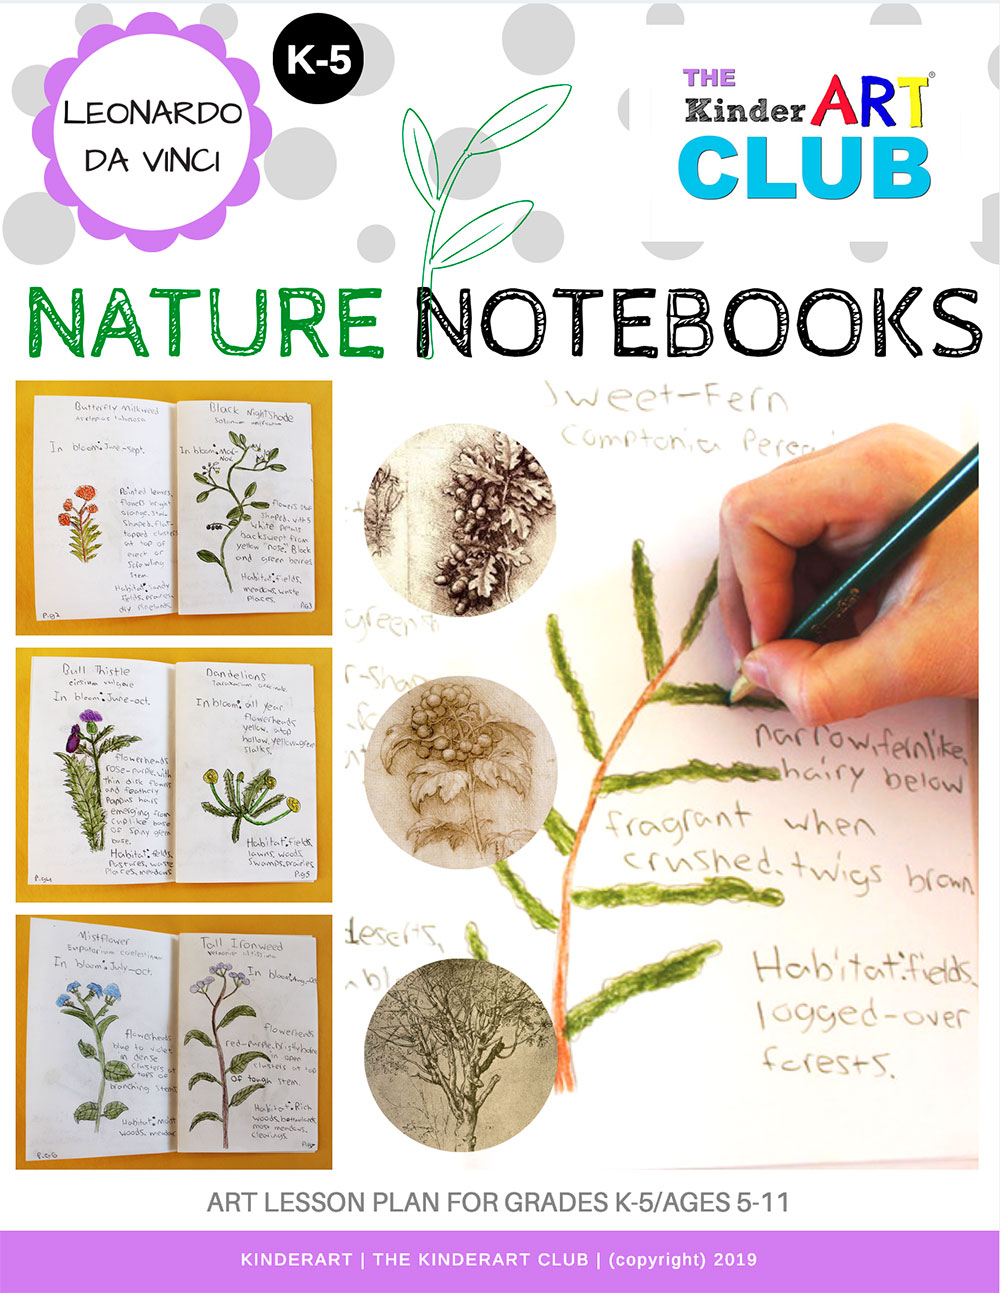 leonardo_nature_notebooks